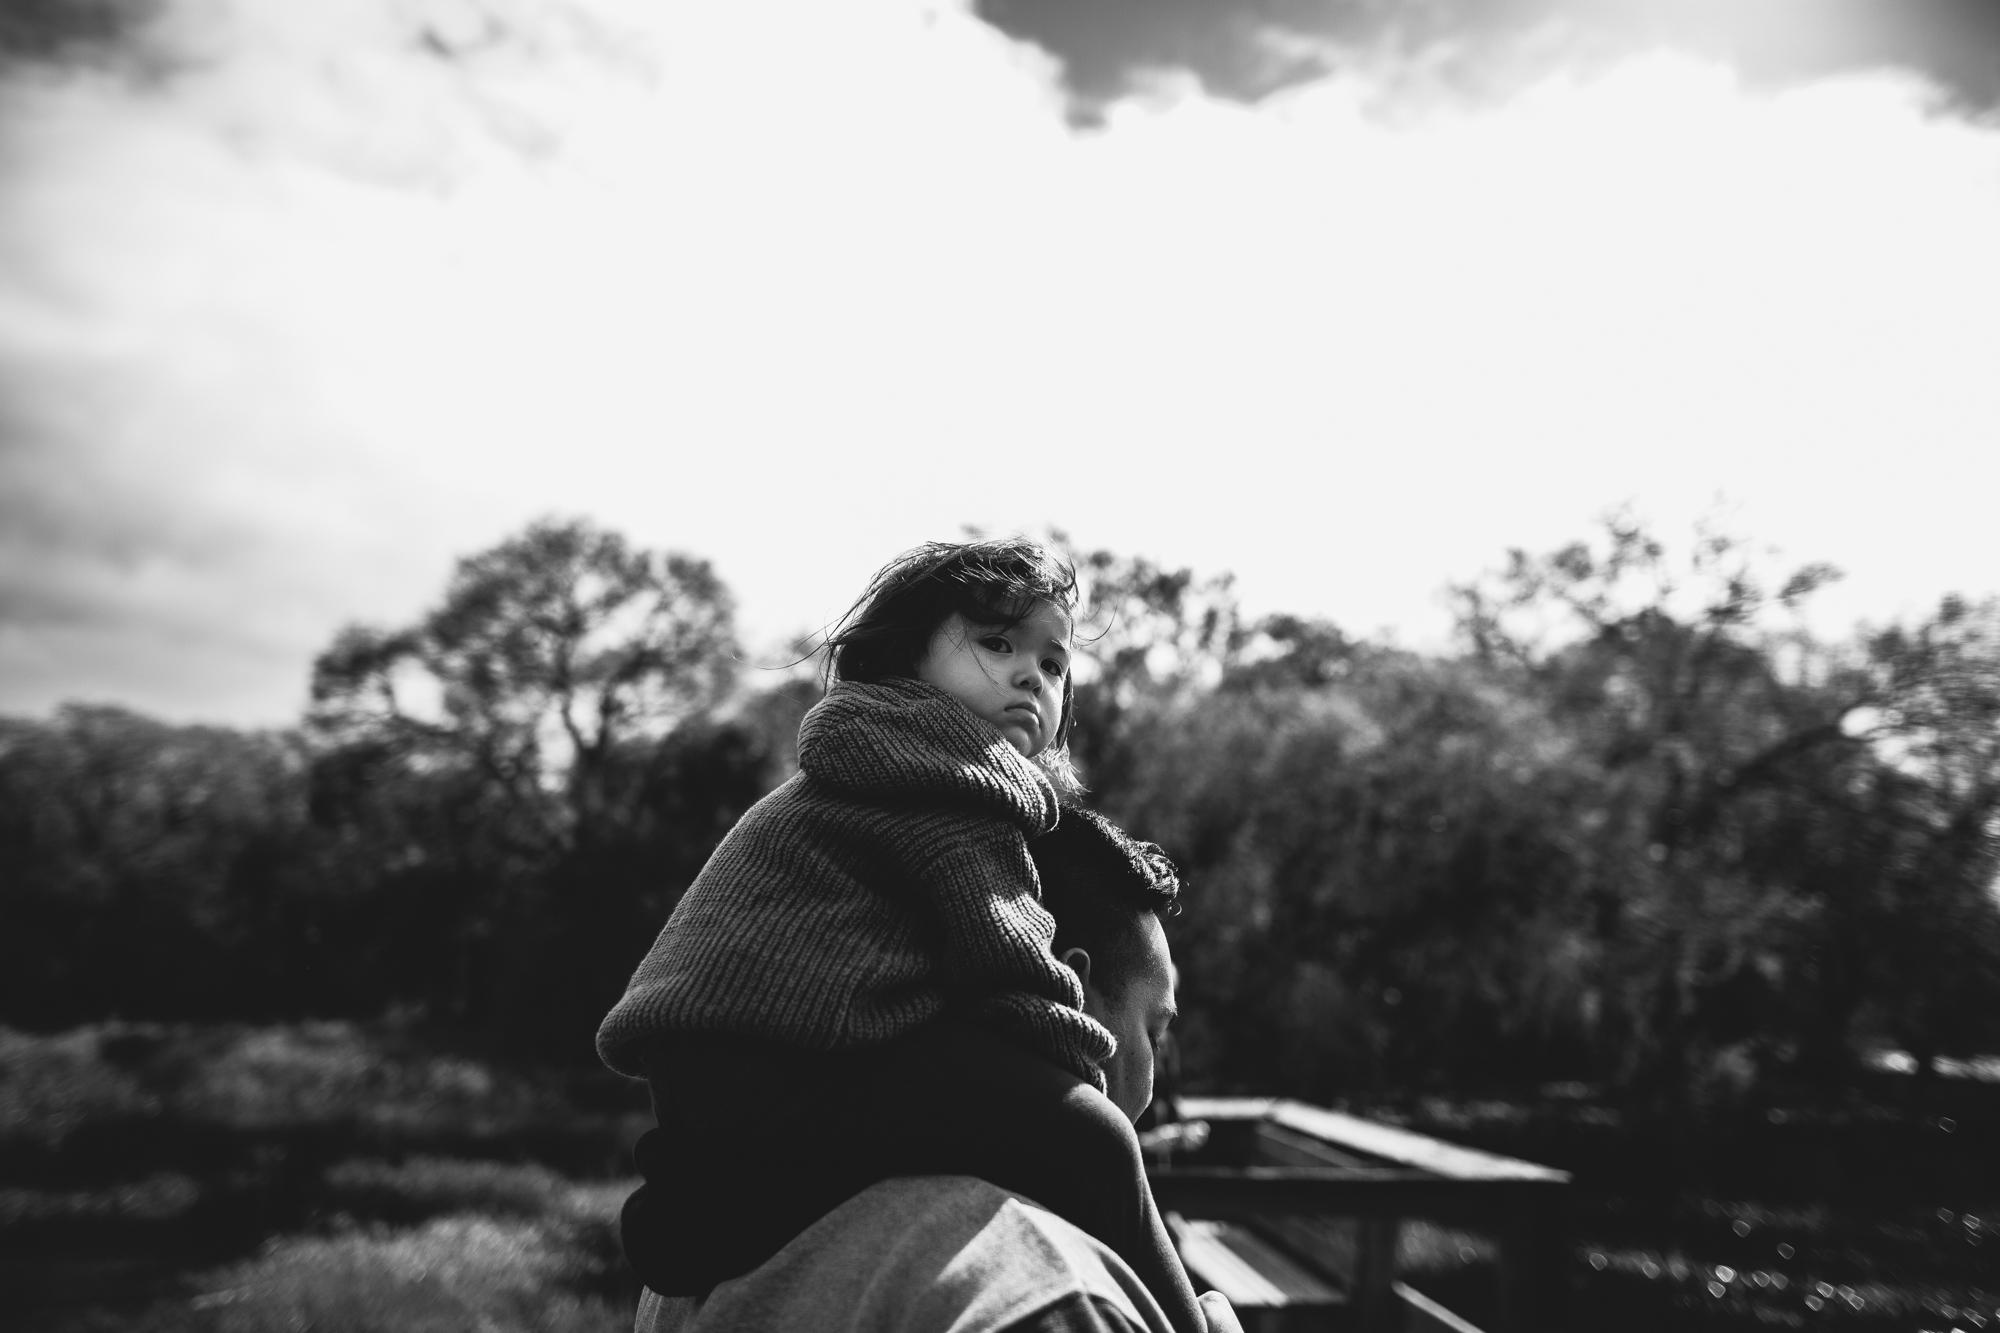 myakka river state park, family photo session